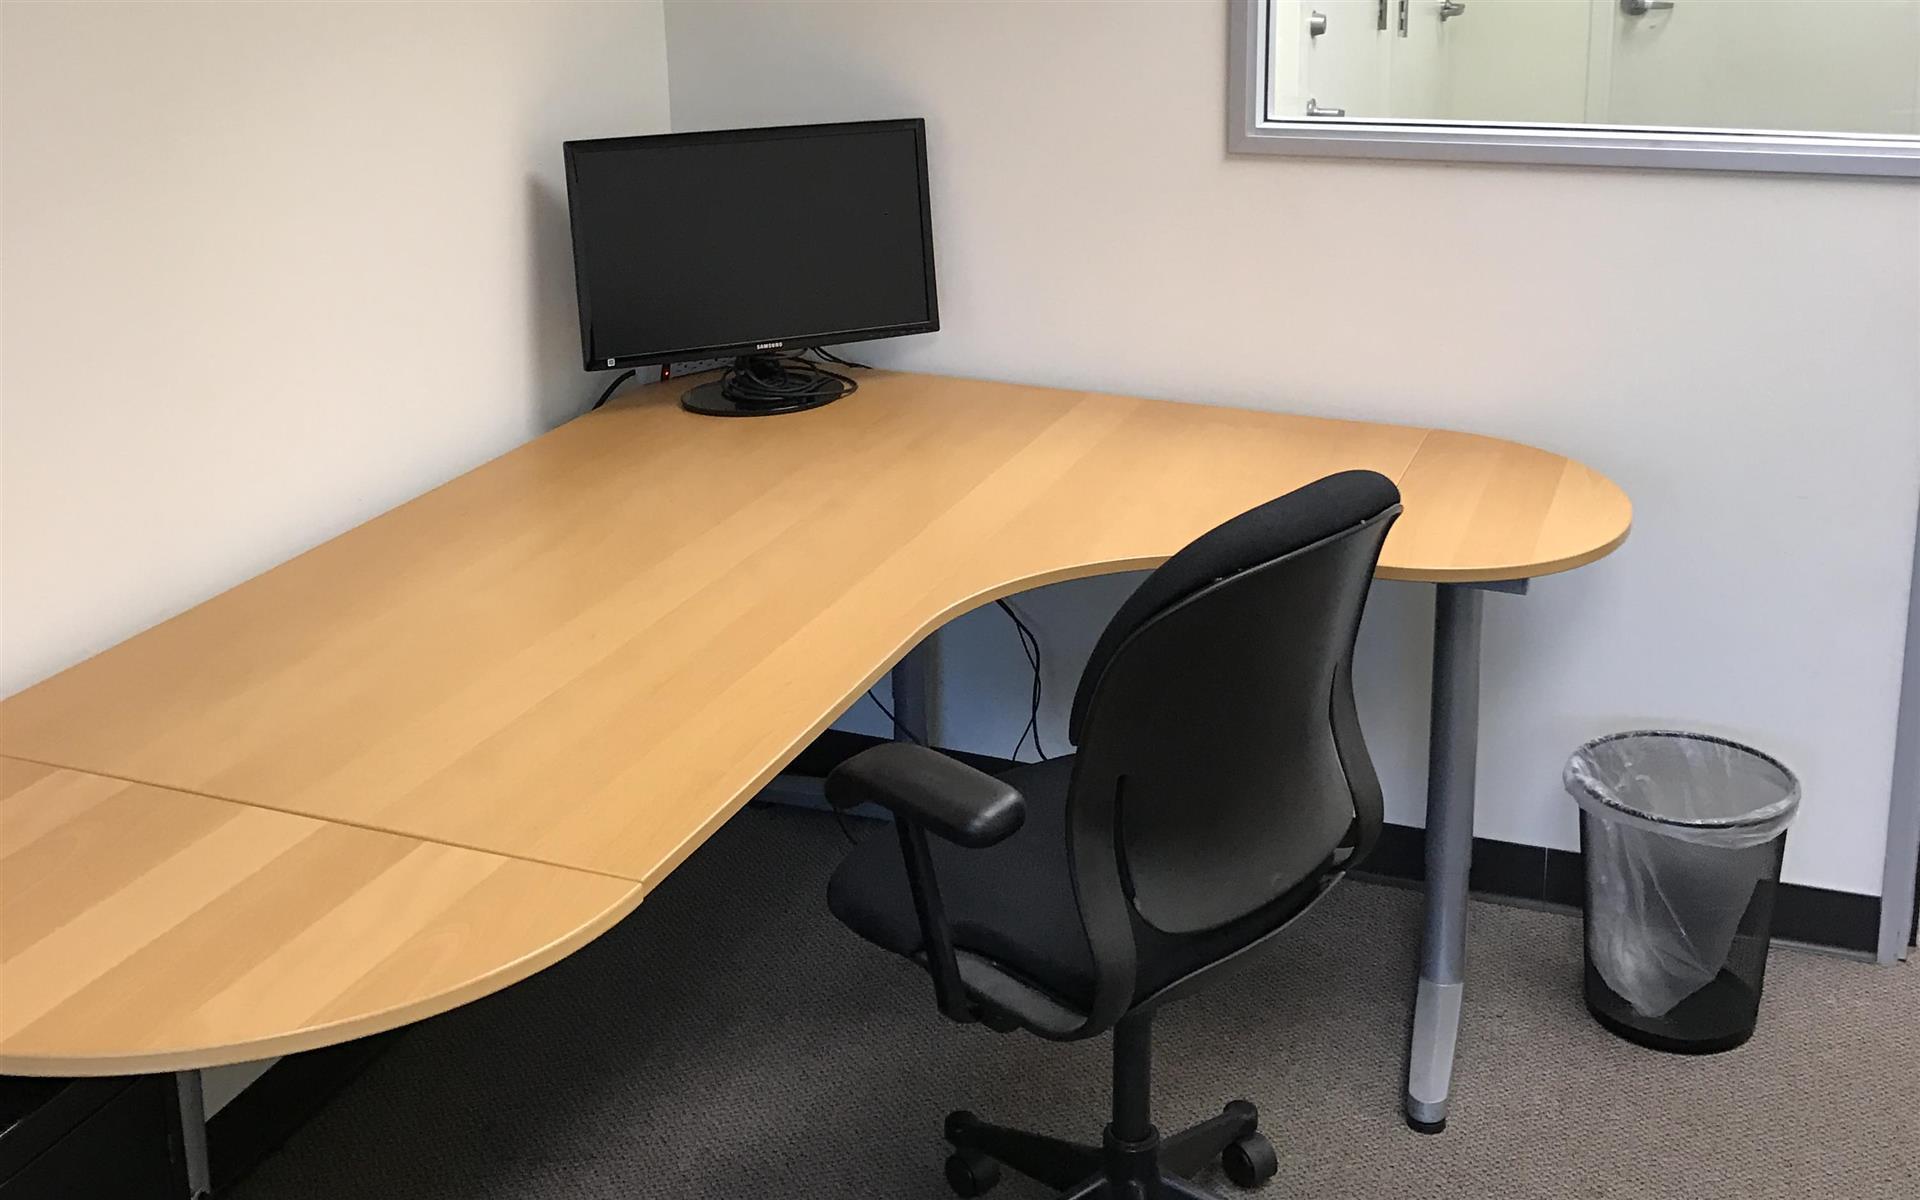 Light Modern Work Space - Desk in Semi-Private Office